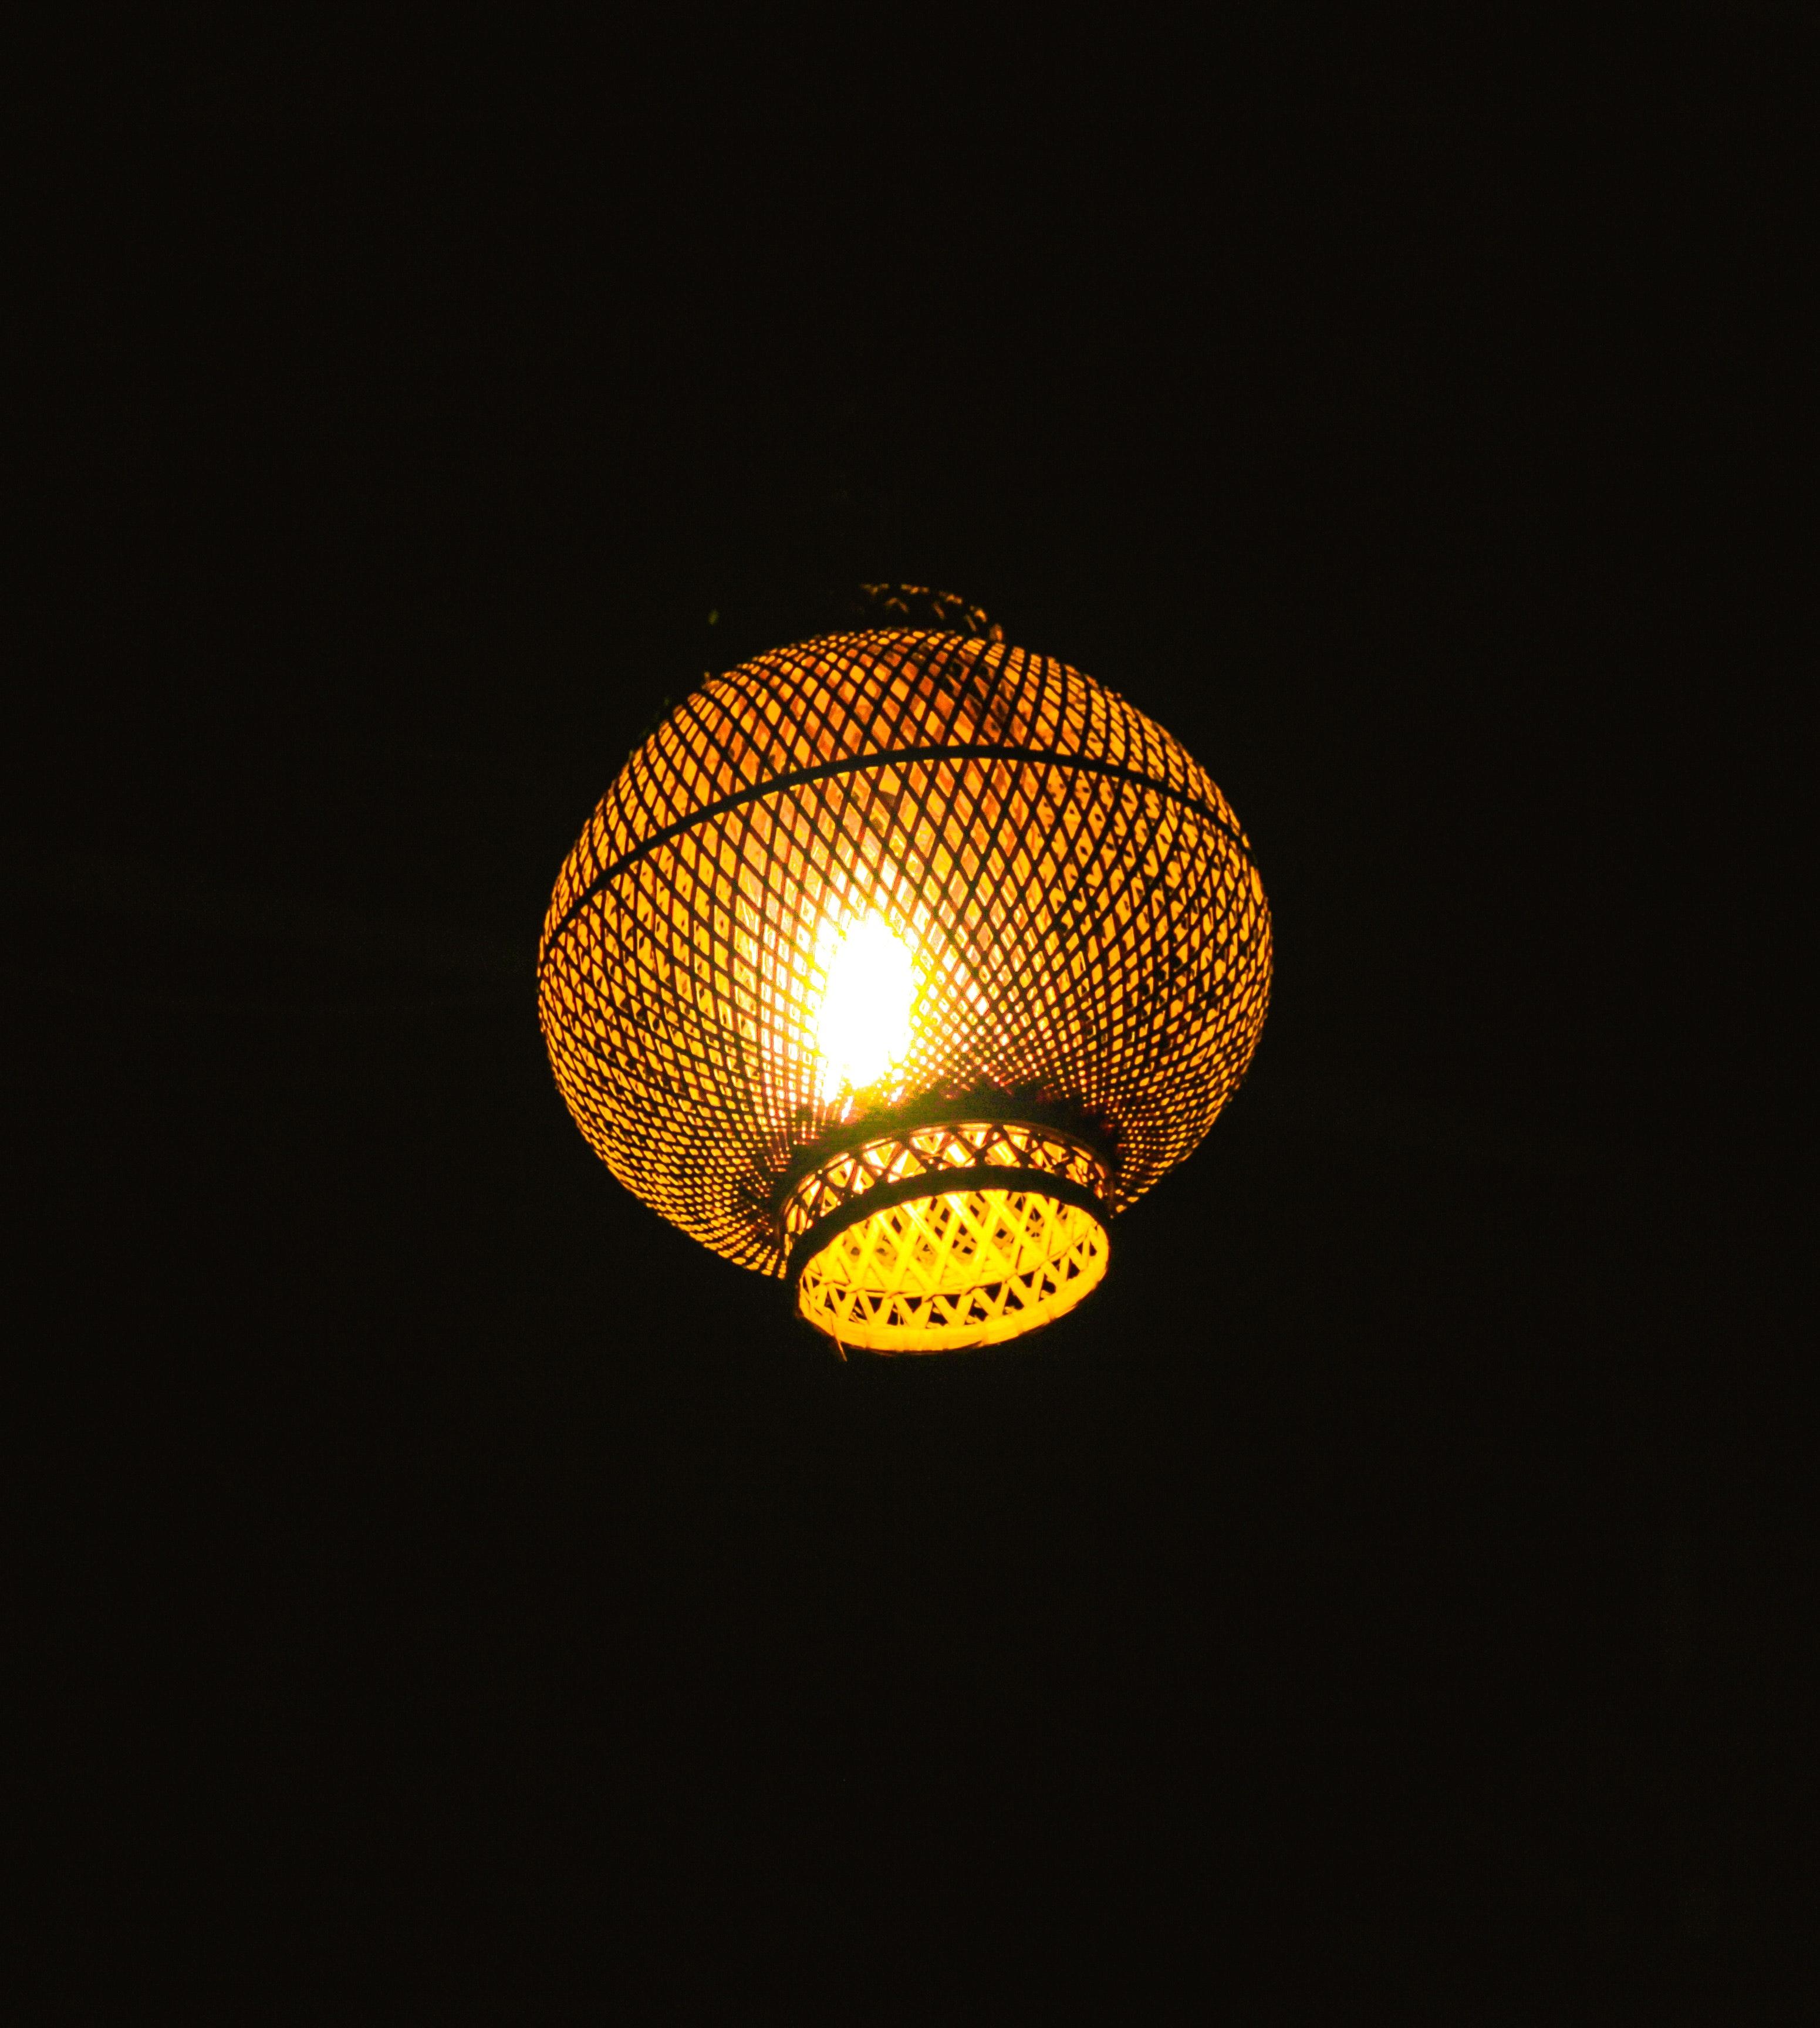 Free Stock Photo Of Golden Lamp In The Dark Light